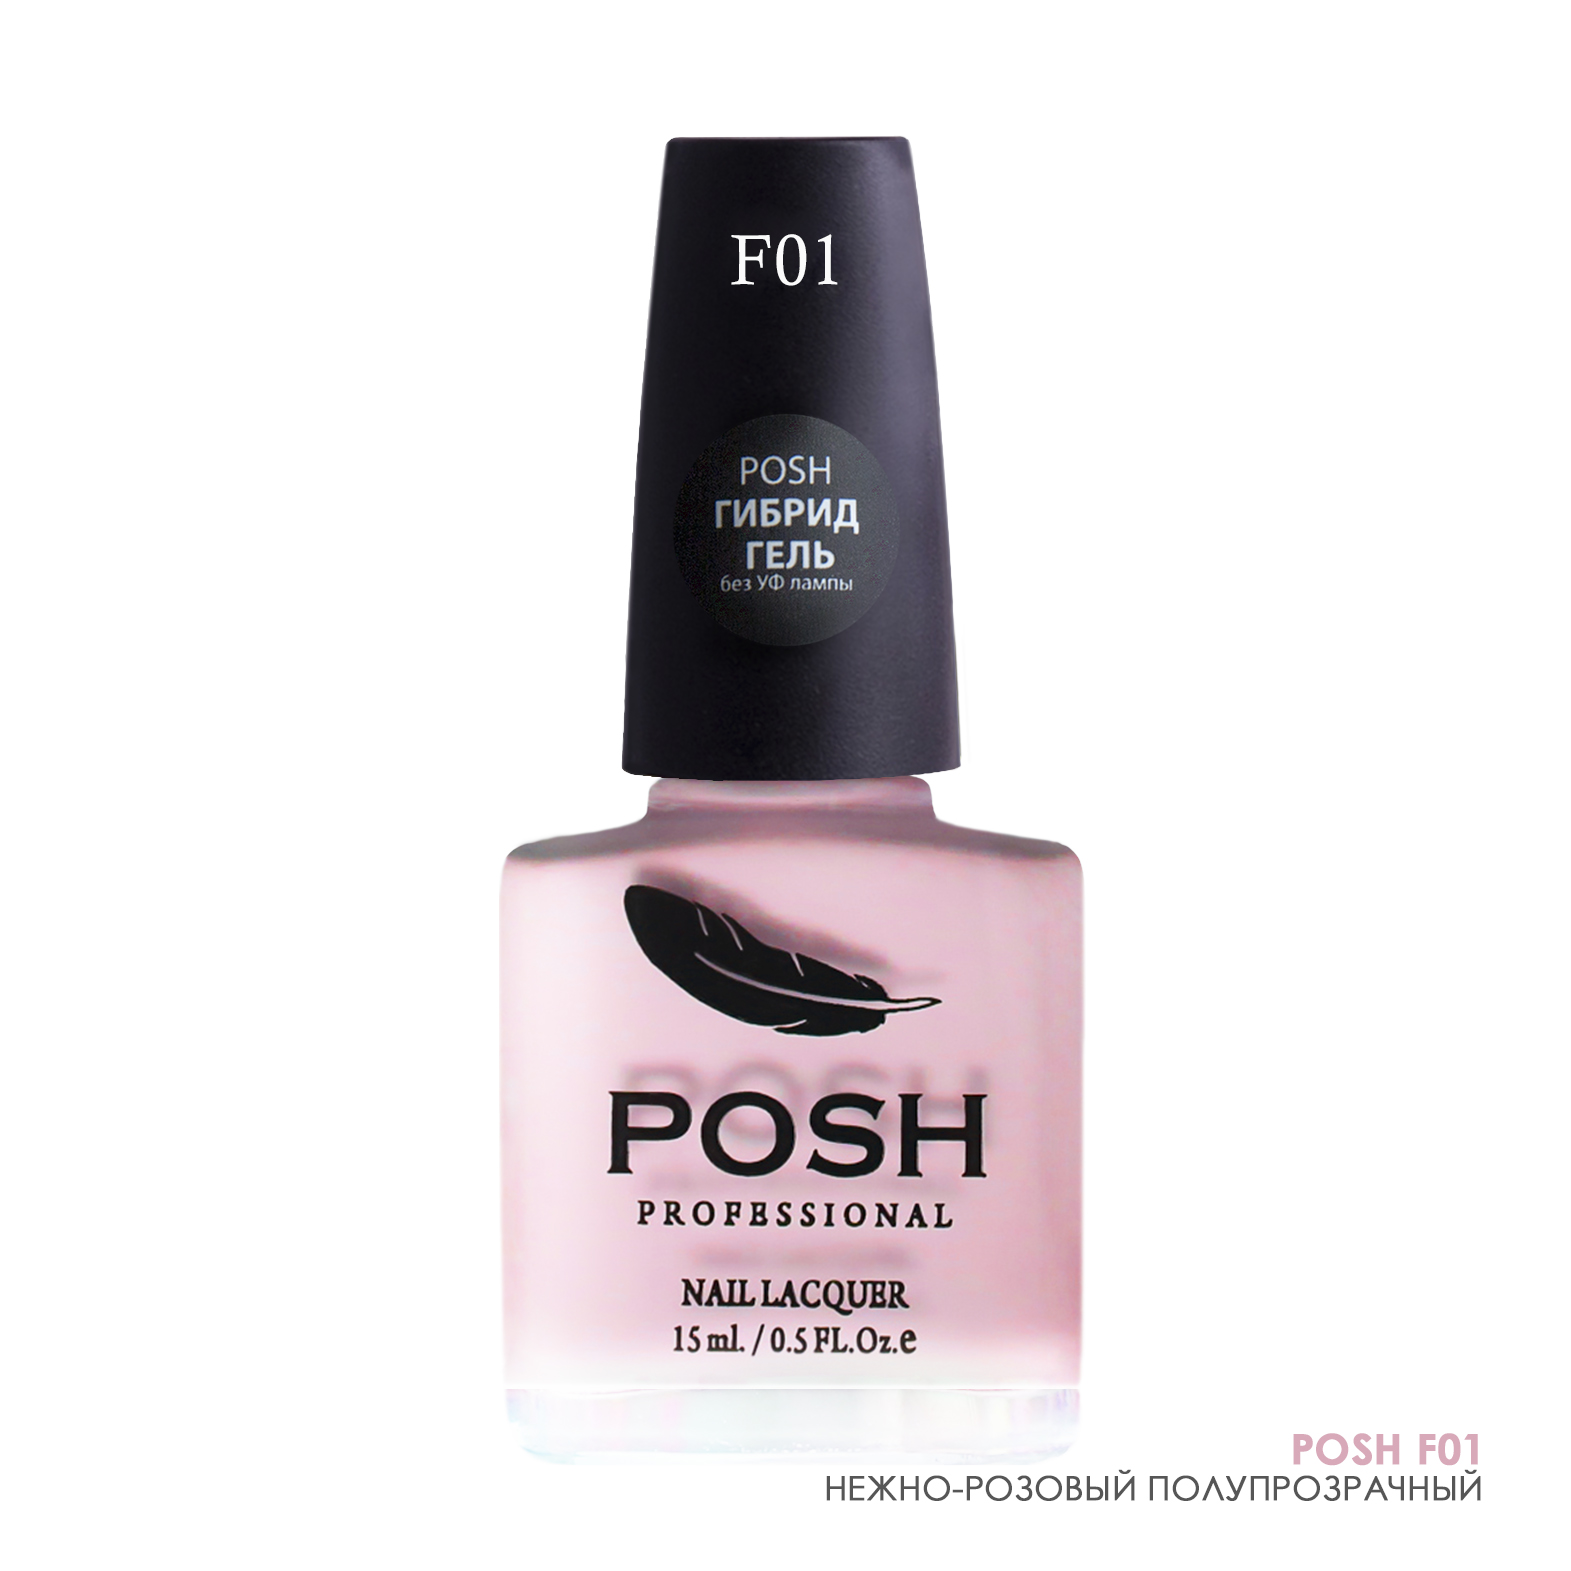 POSH 01F лак для французского маникюра Нежно-розовый 15 мл фото